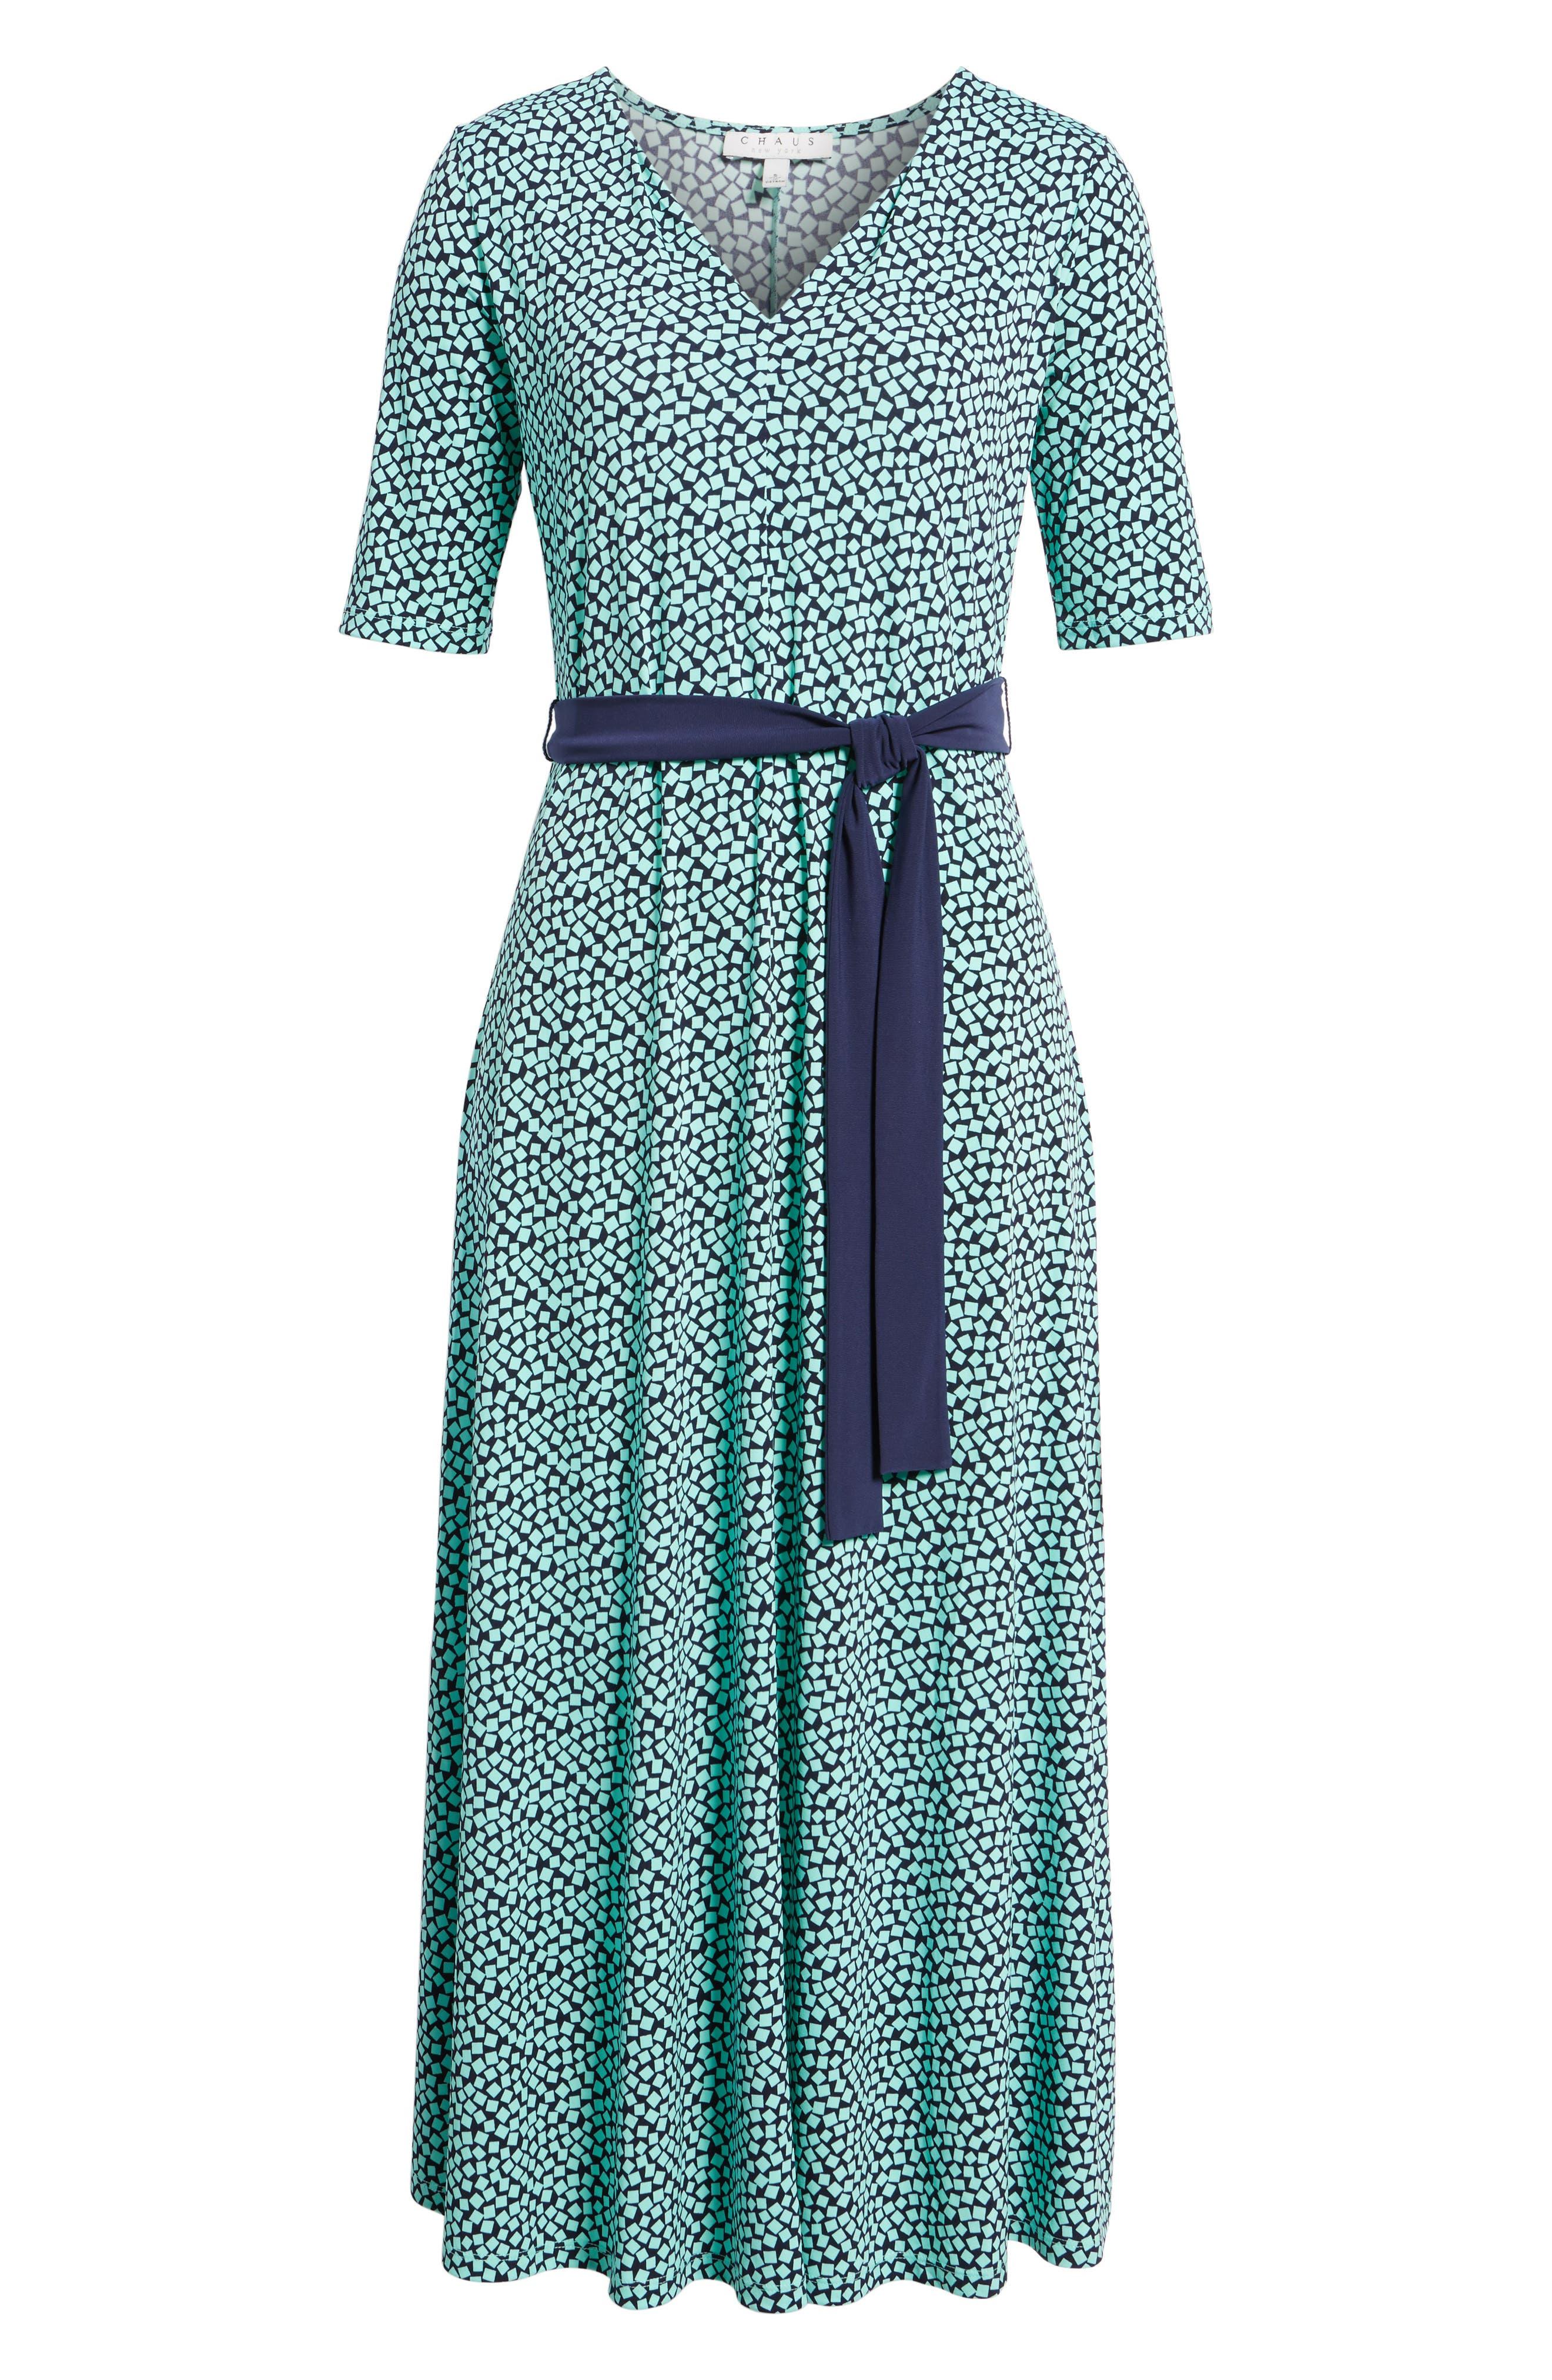 Belted Cube Print Midi Dress,                             Alternate thumbnail 6, color,                             336